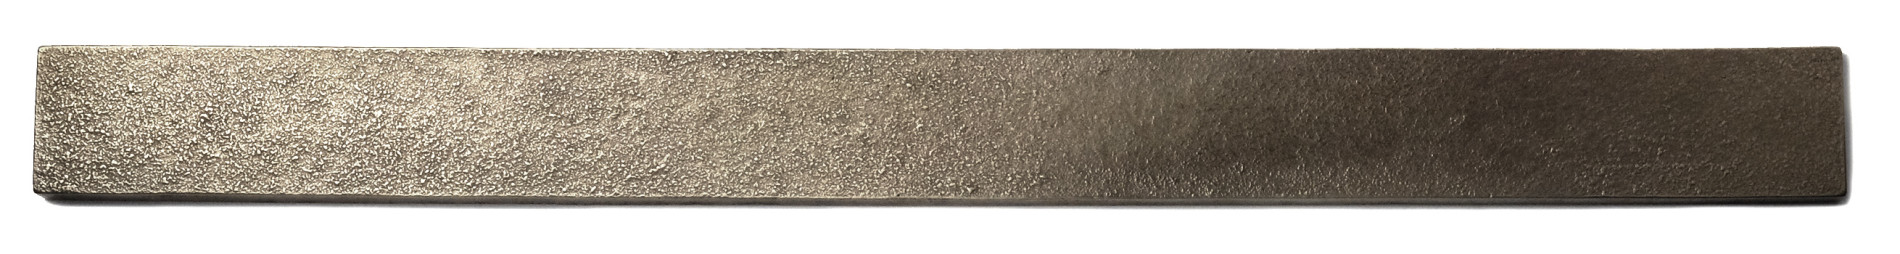 Origin Liner 1x12 inch accent liner White Bronze